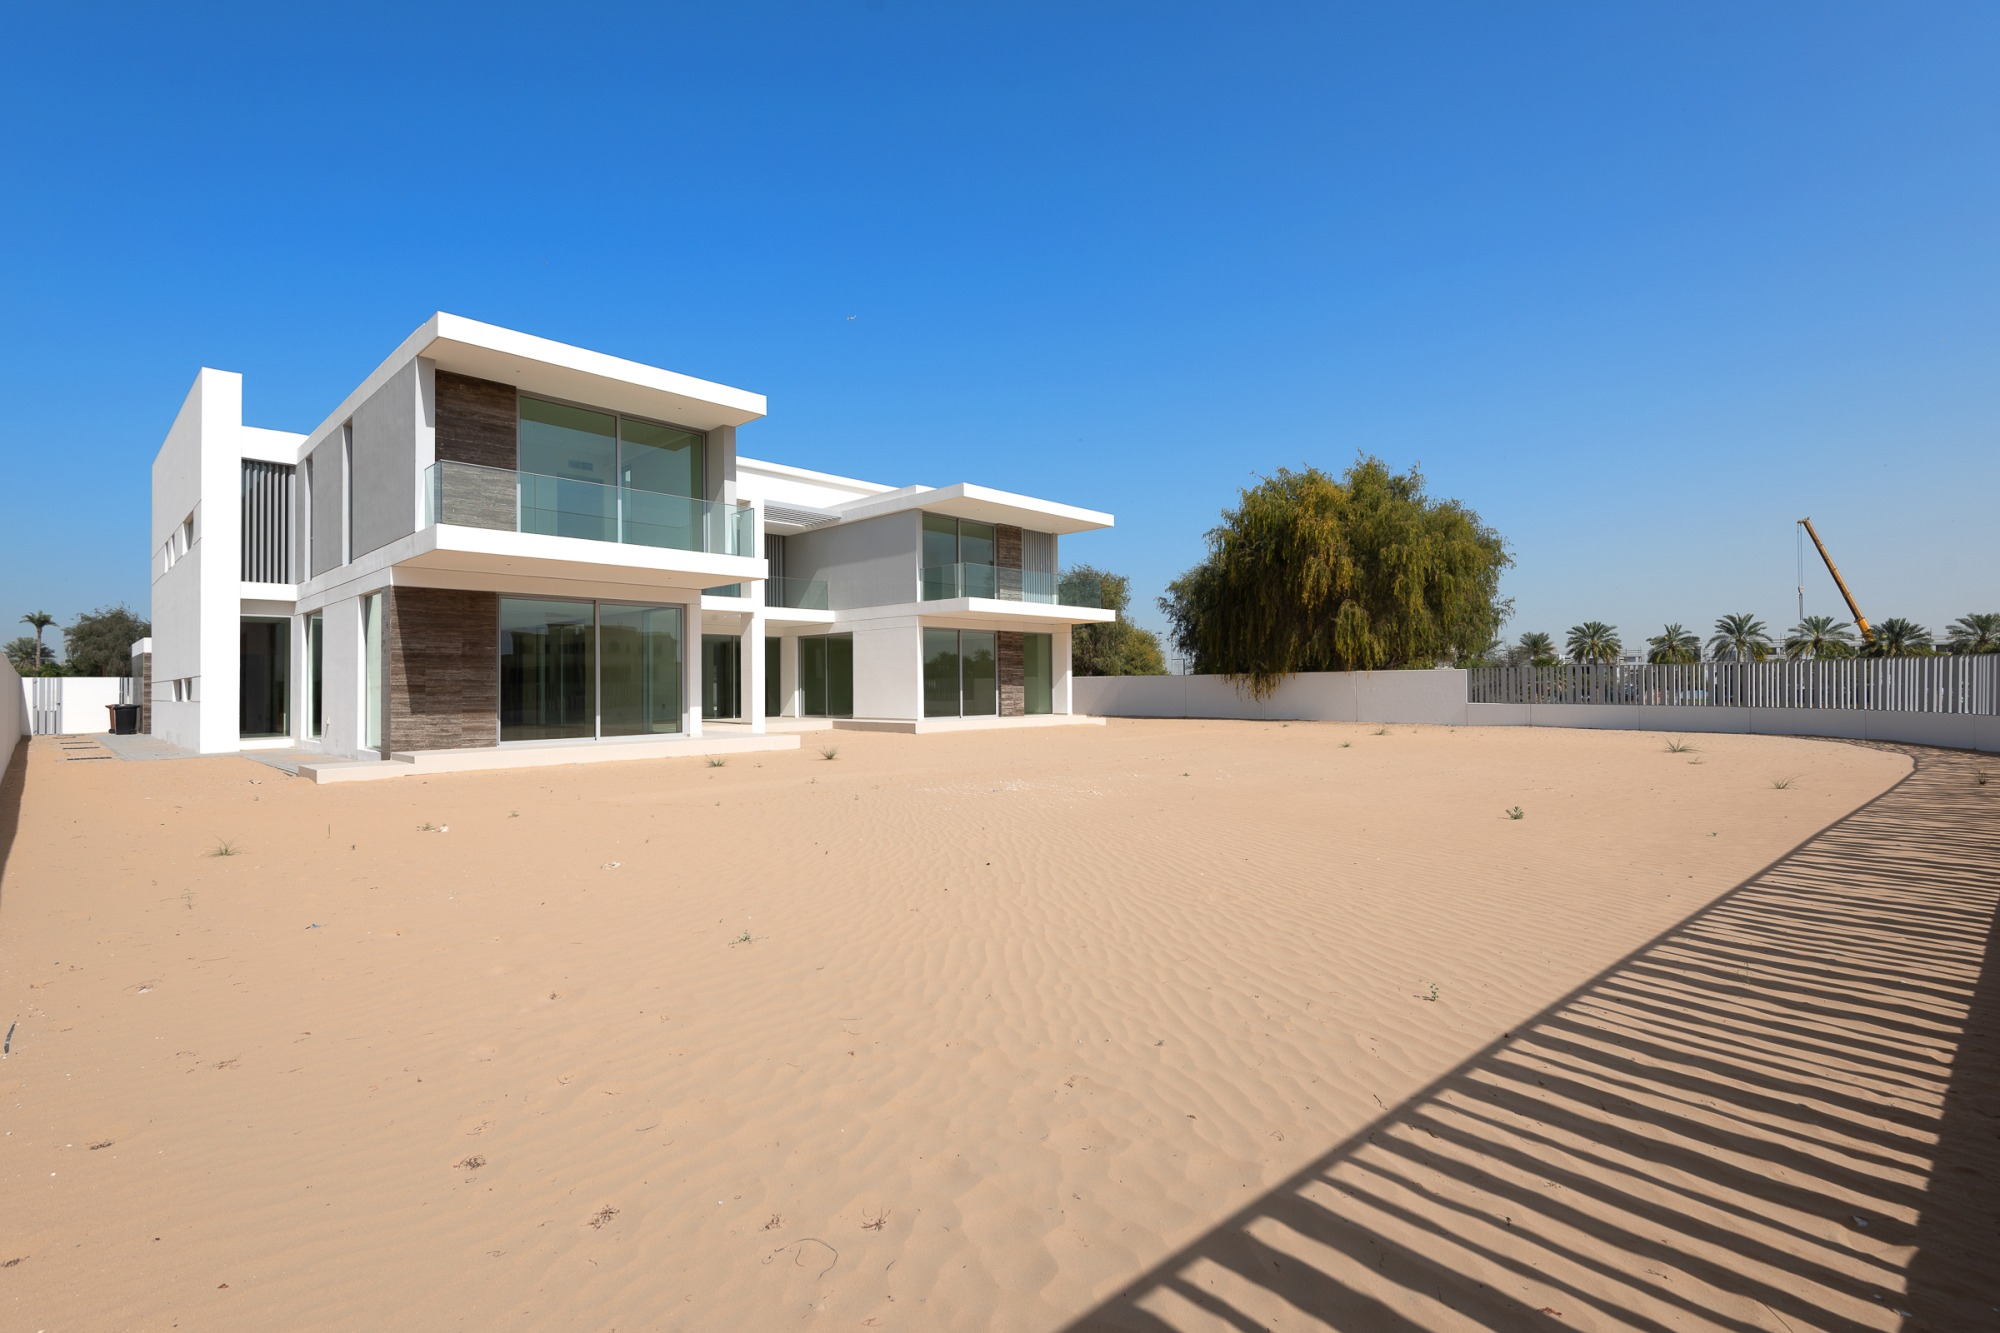 7BR Villa | 20,000 SqFt Plot | Pay 30% To Move In